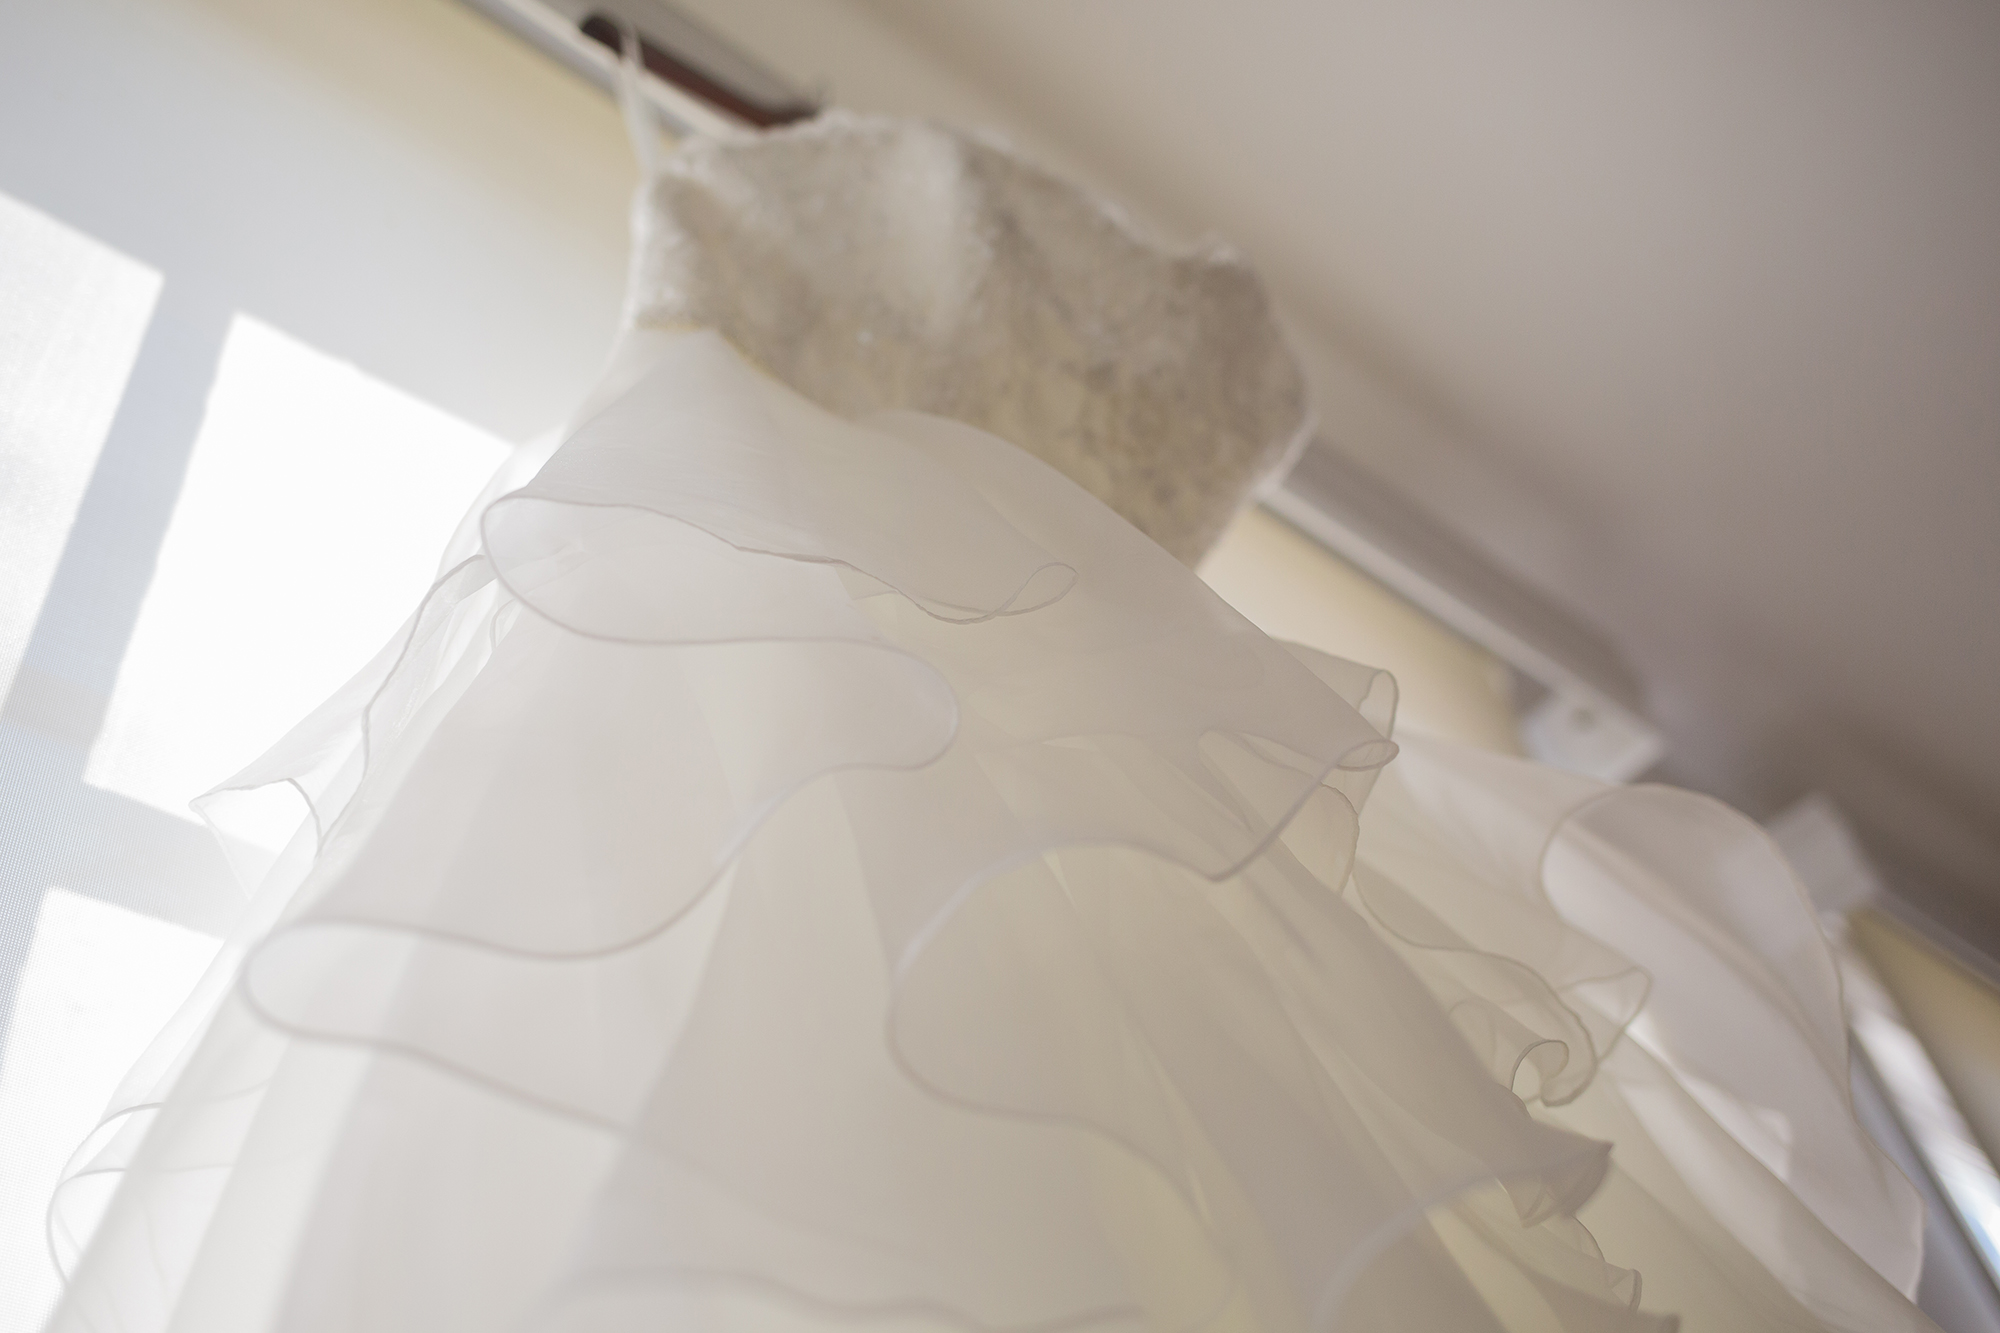 mount-dora-wedding-dresses.jpg